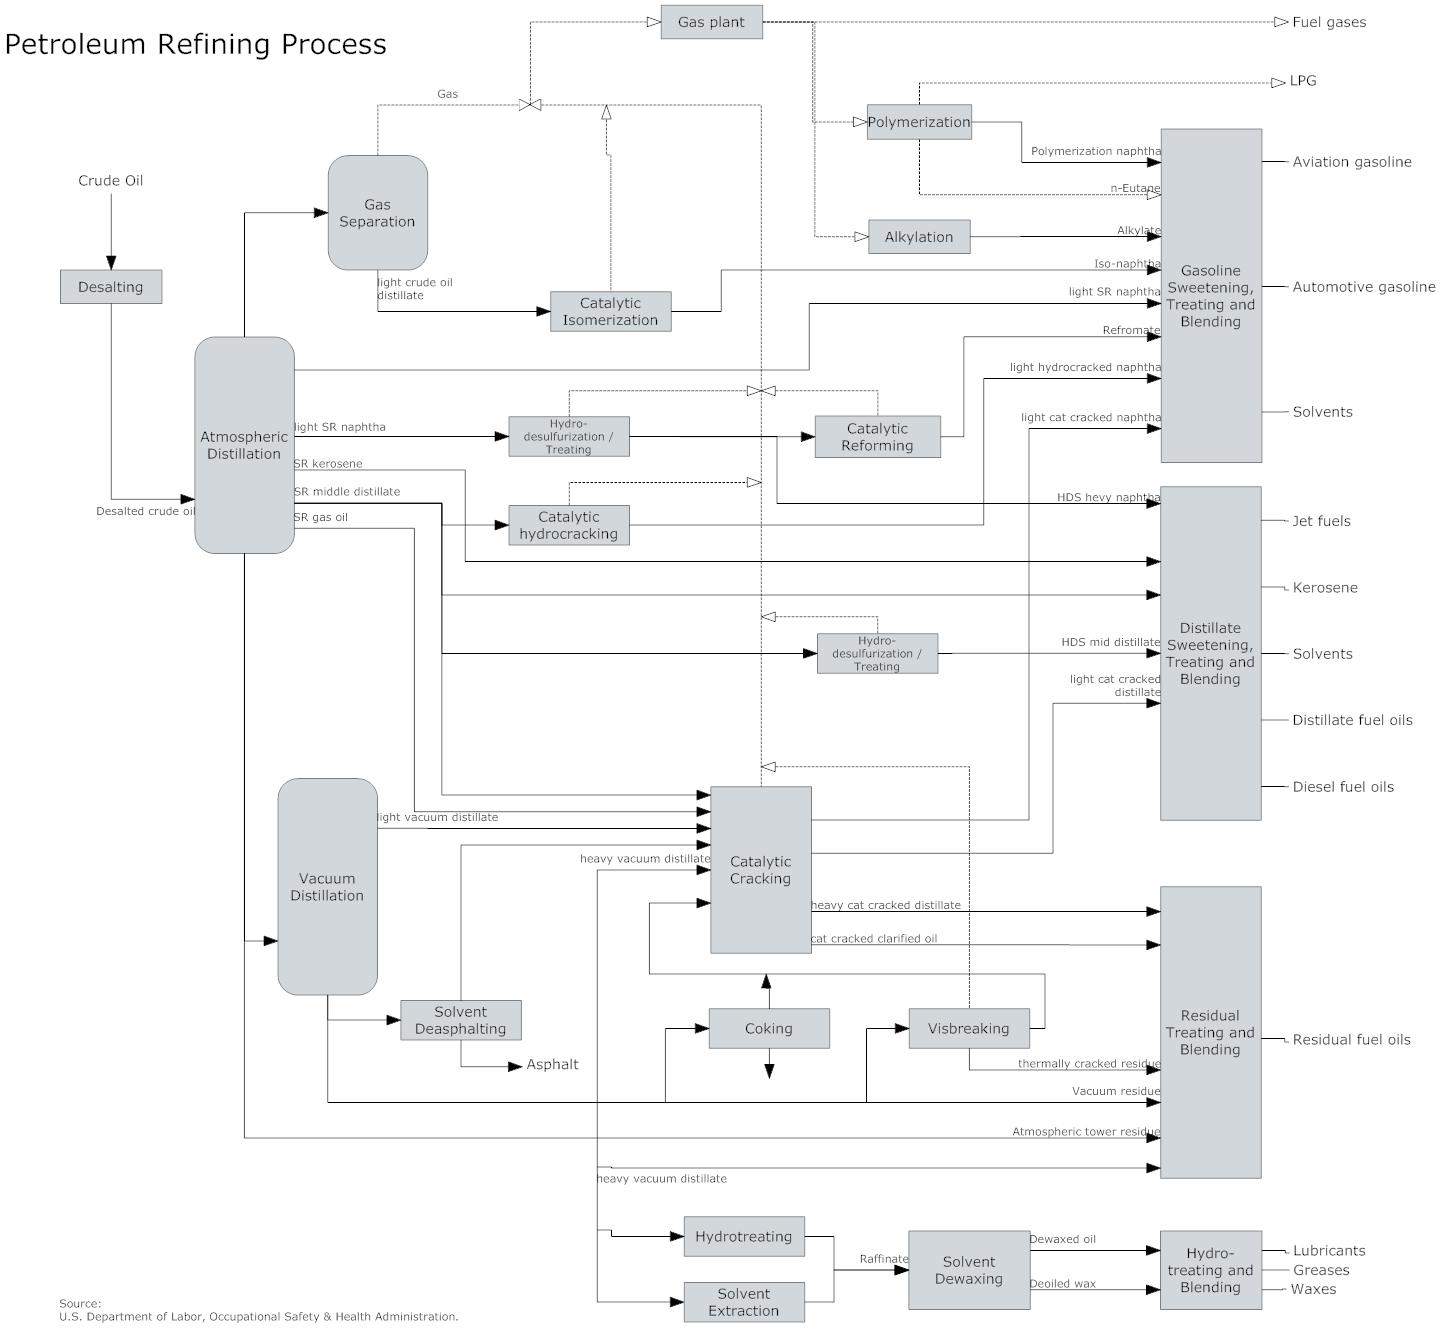 process flow diagram software - free process flow diagram pfd templates  smartdraw